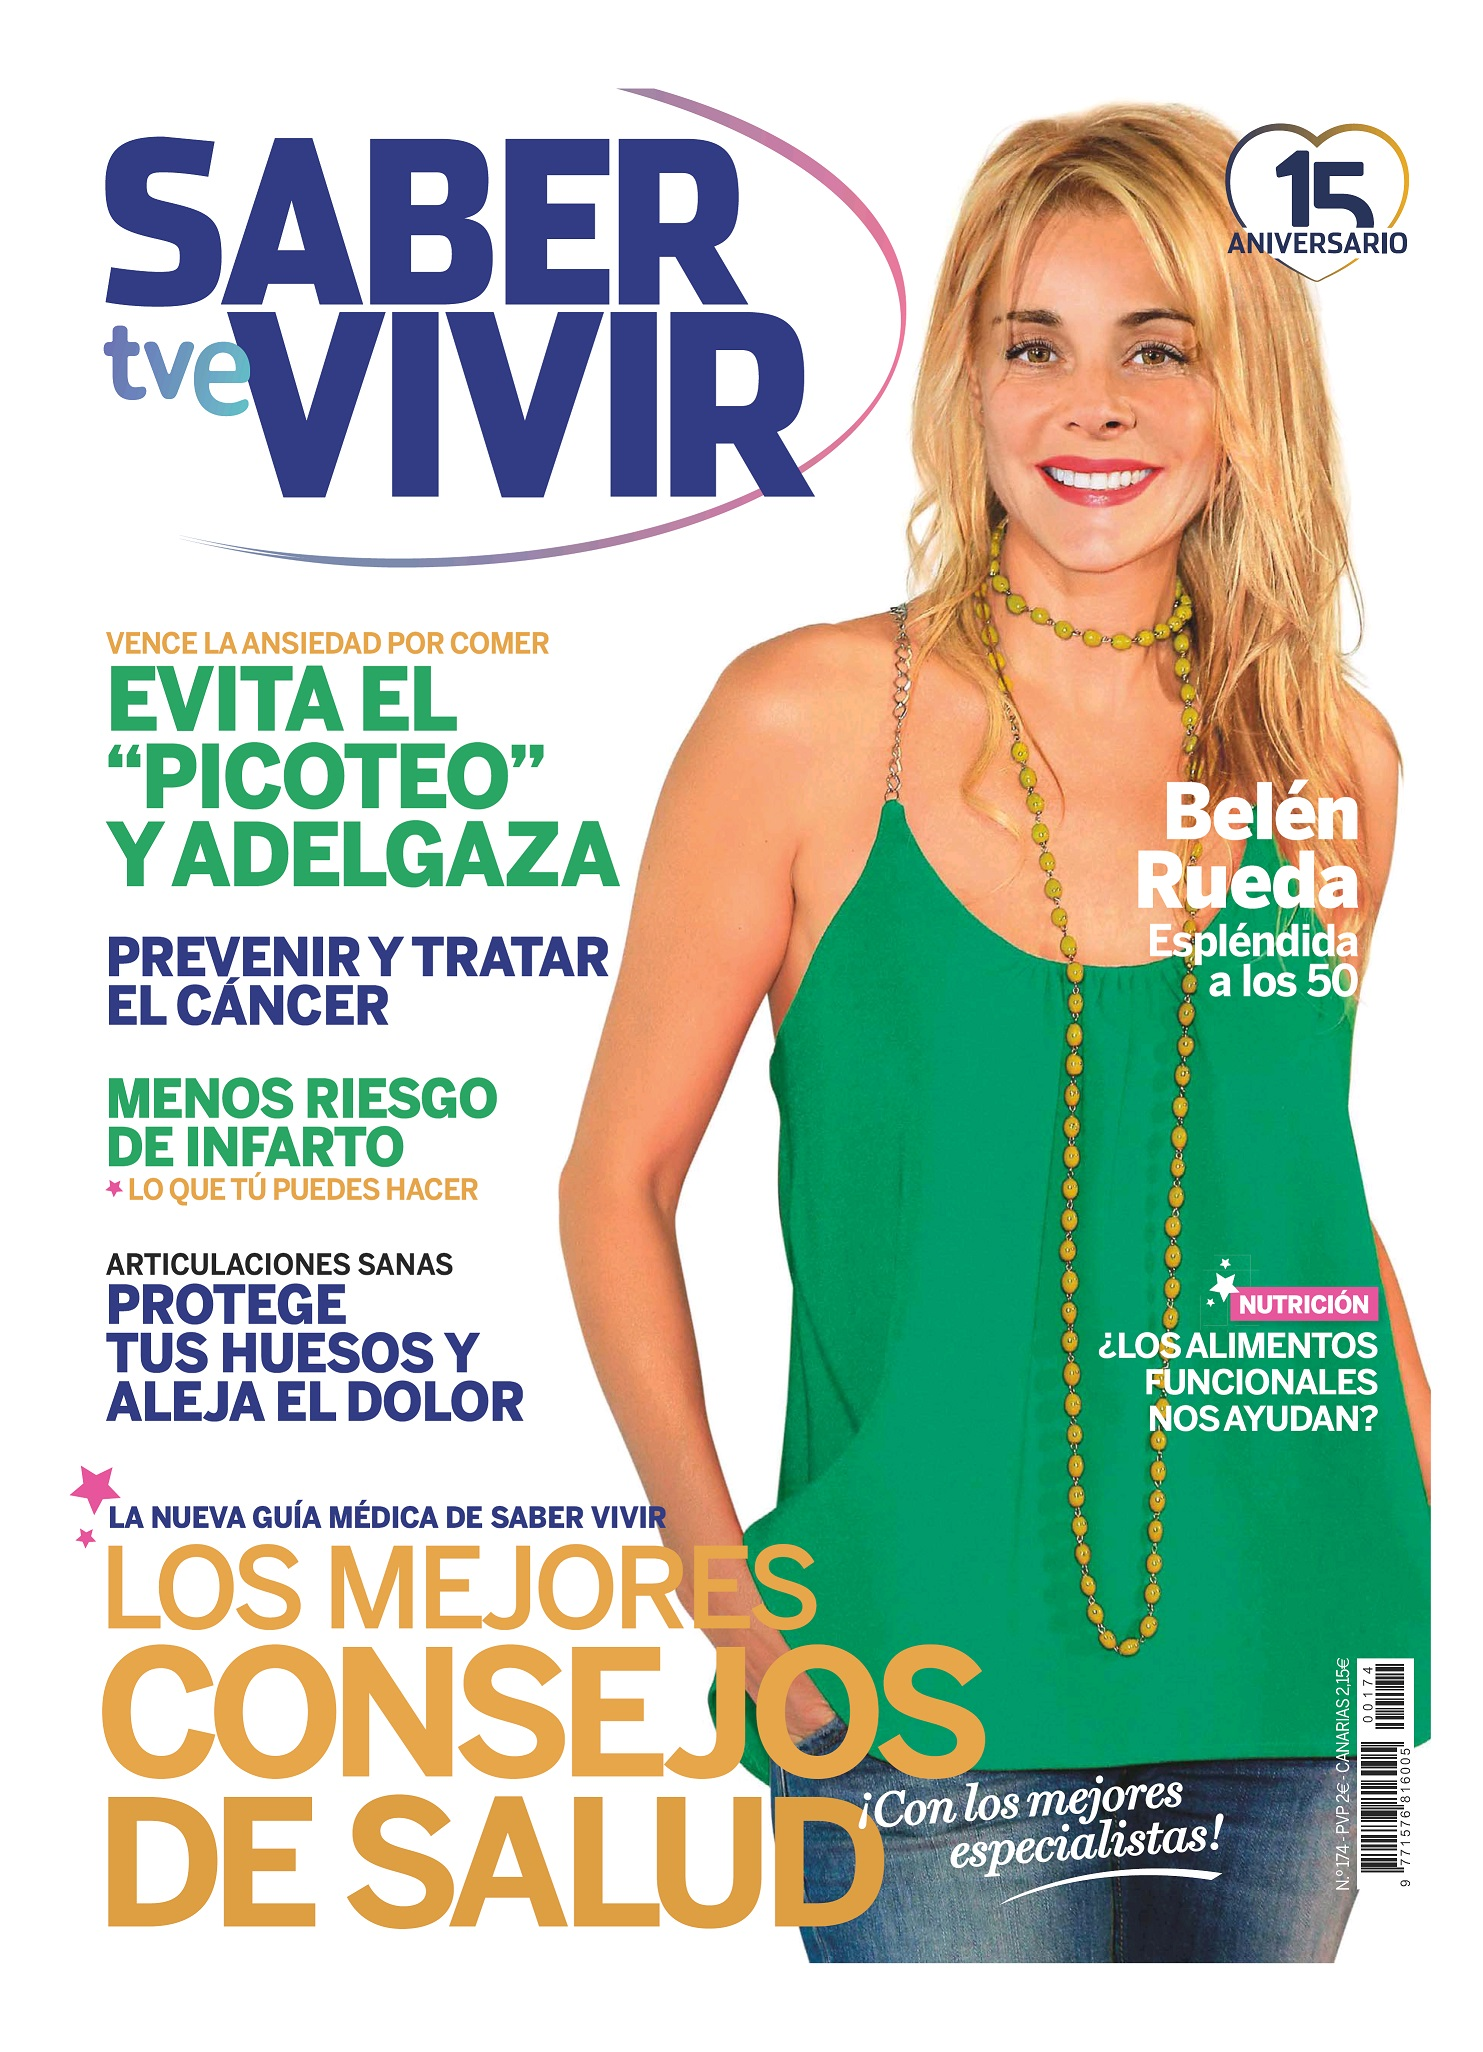 SABER VIVIR portada Abril 2015